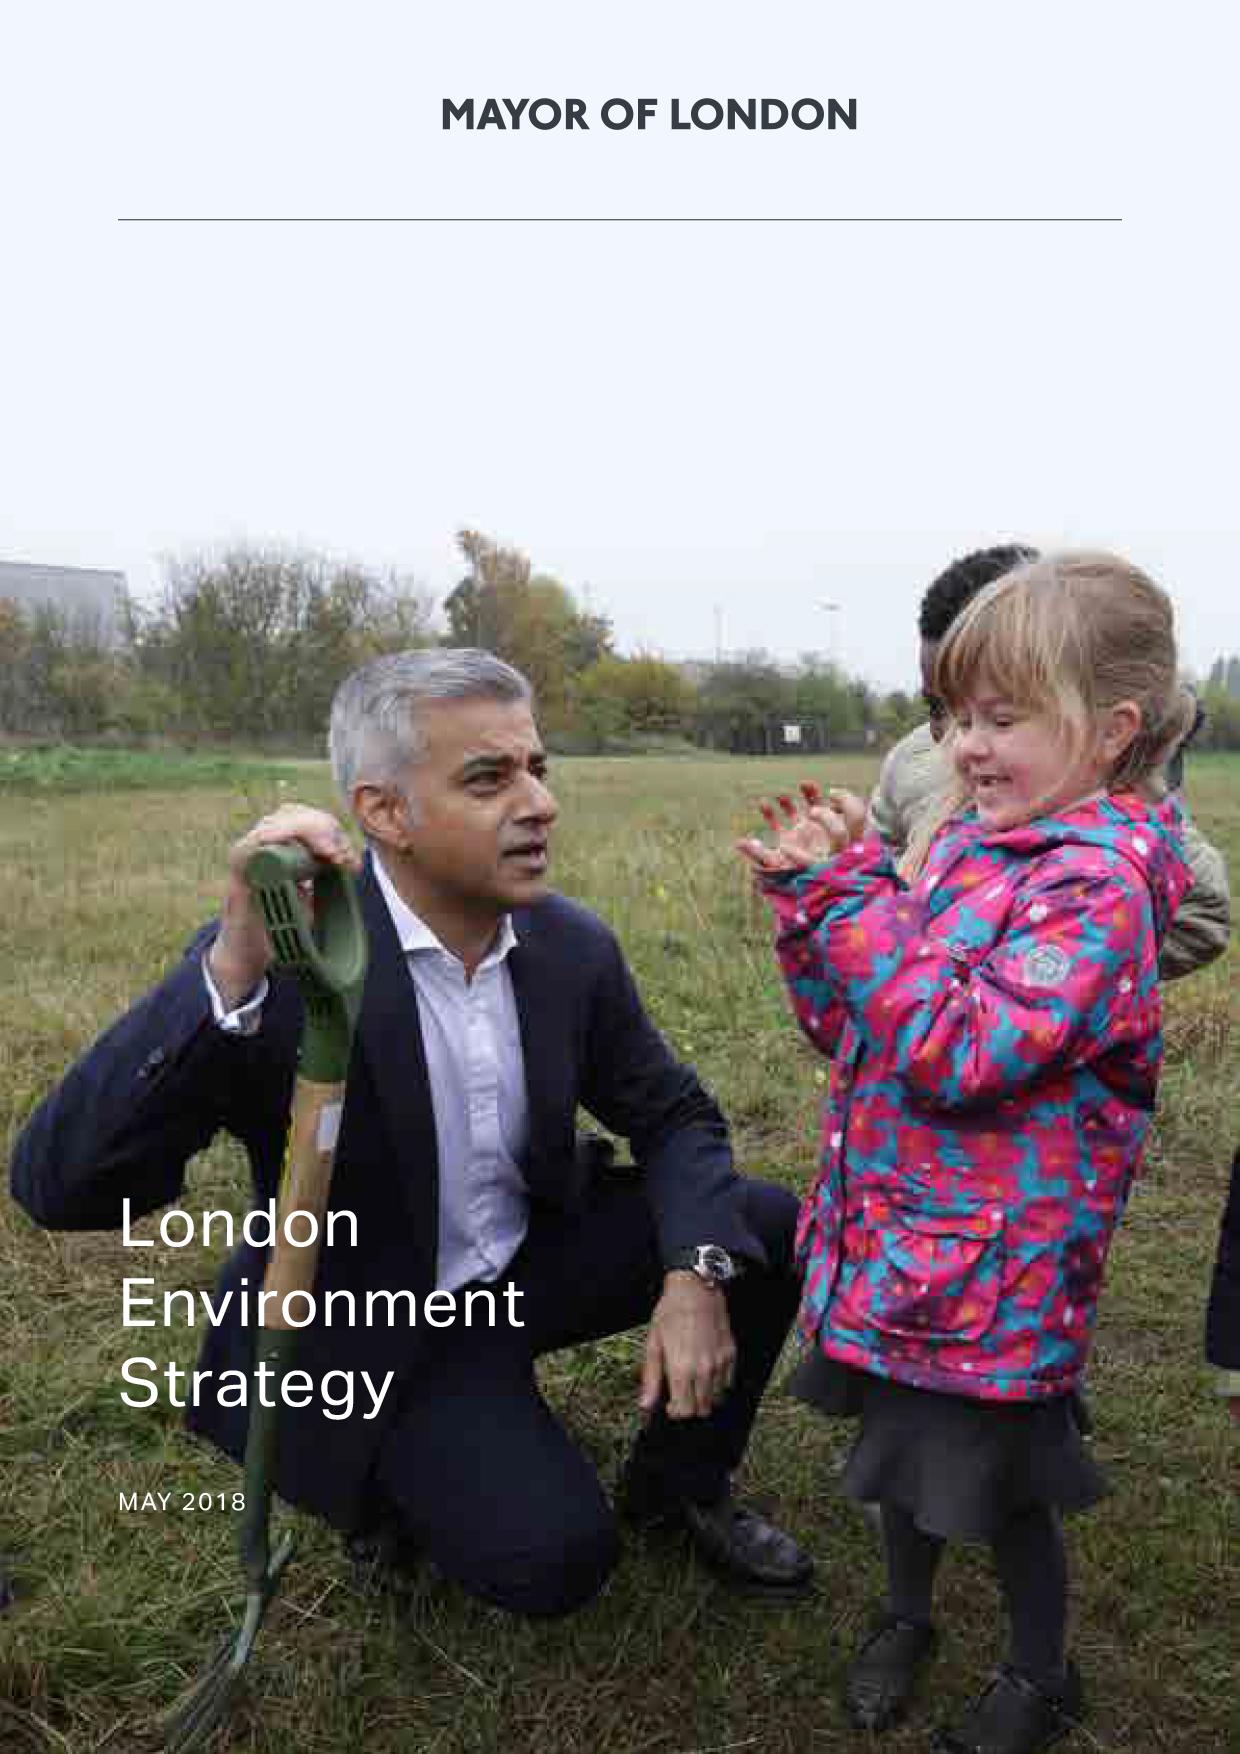 London Environment Strategy